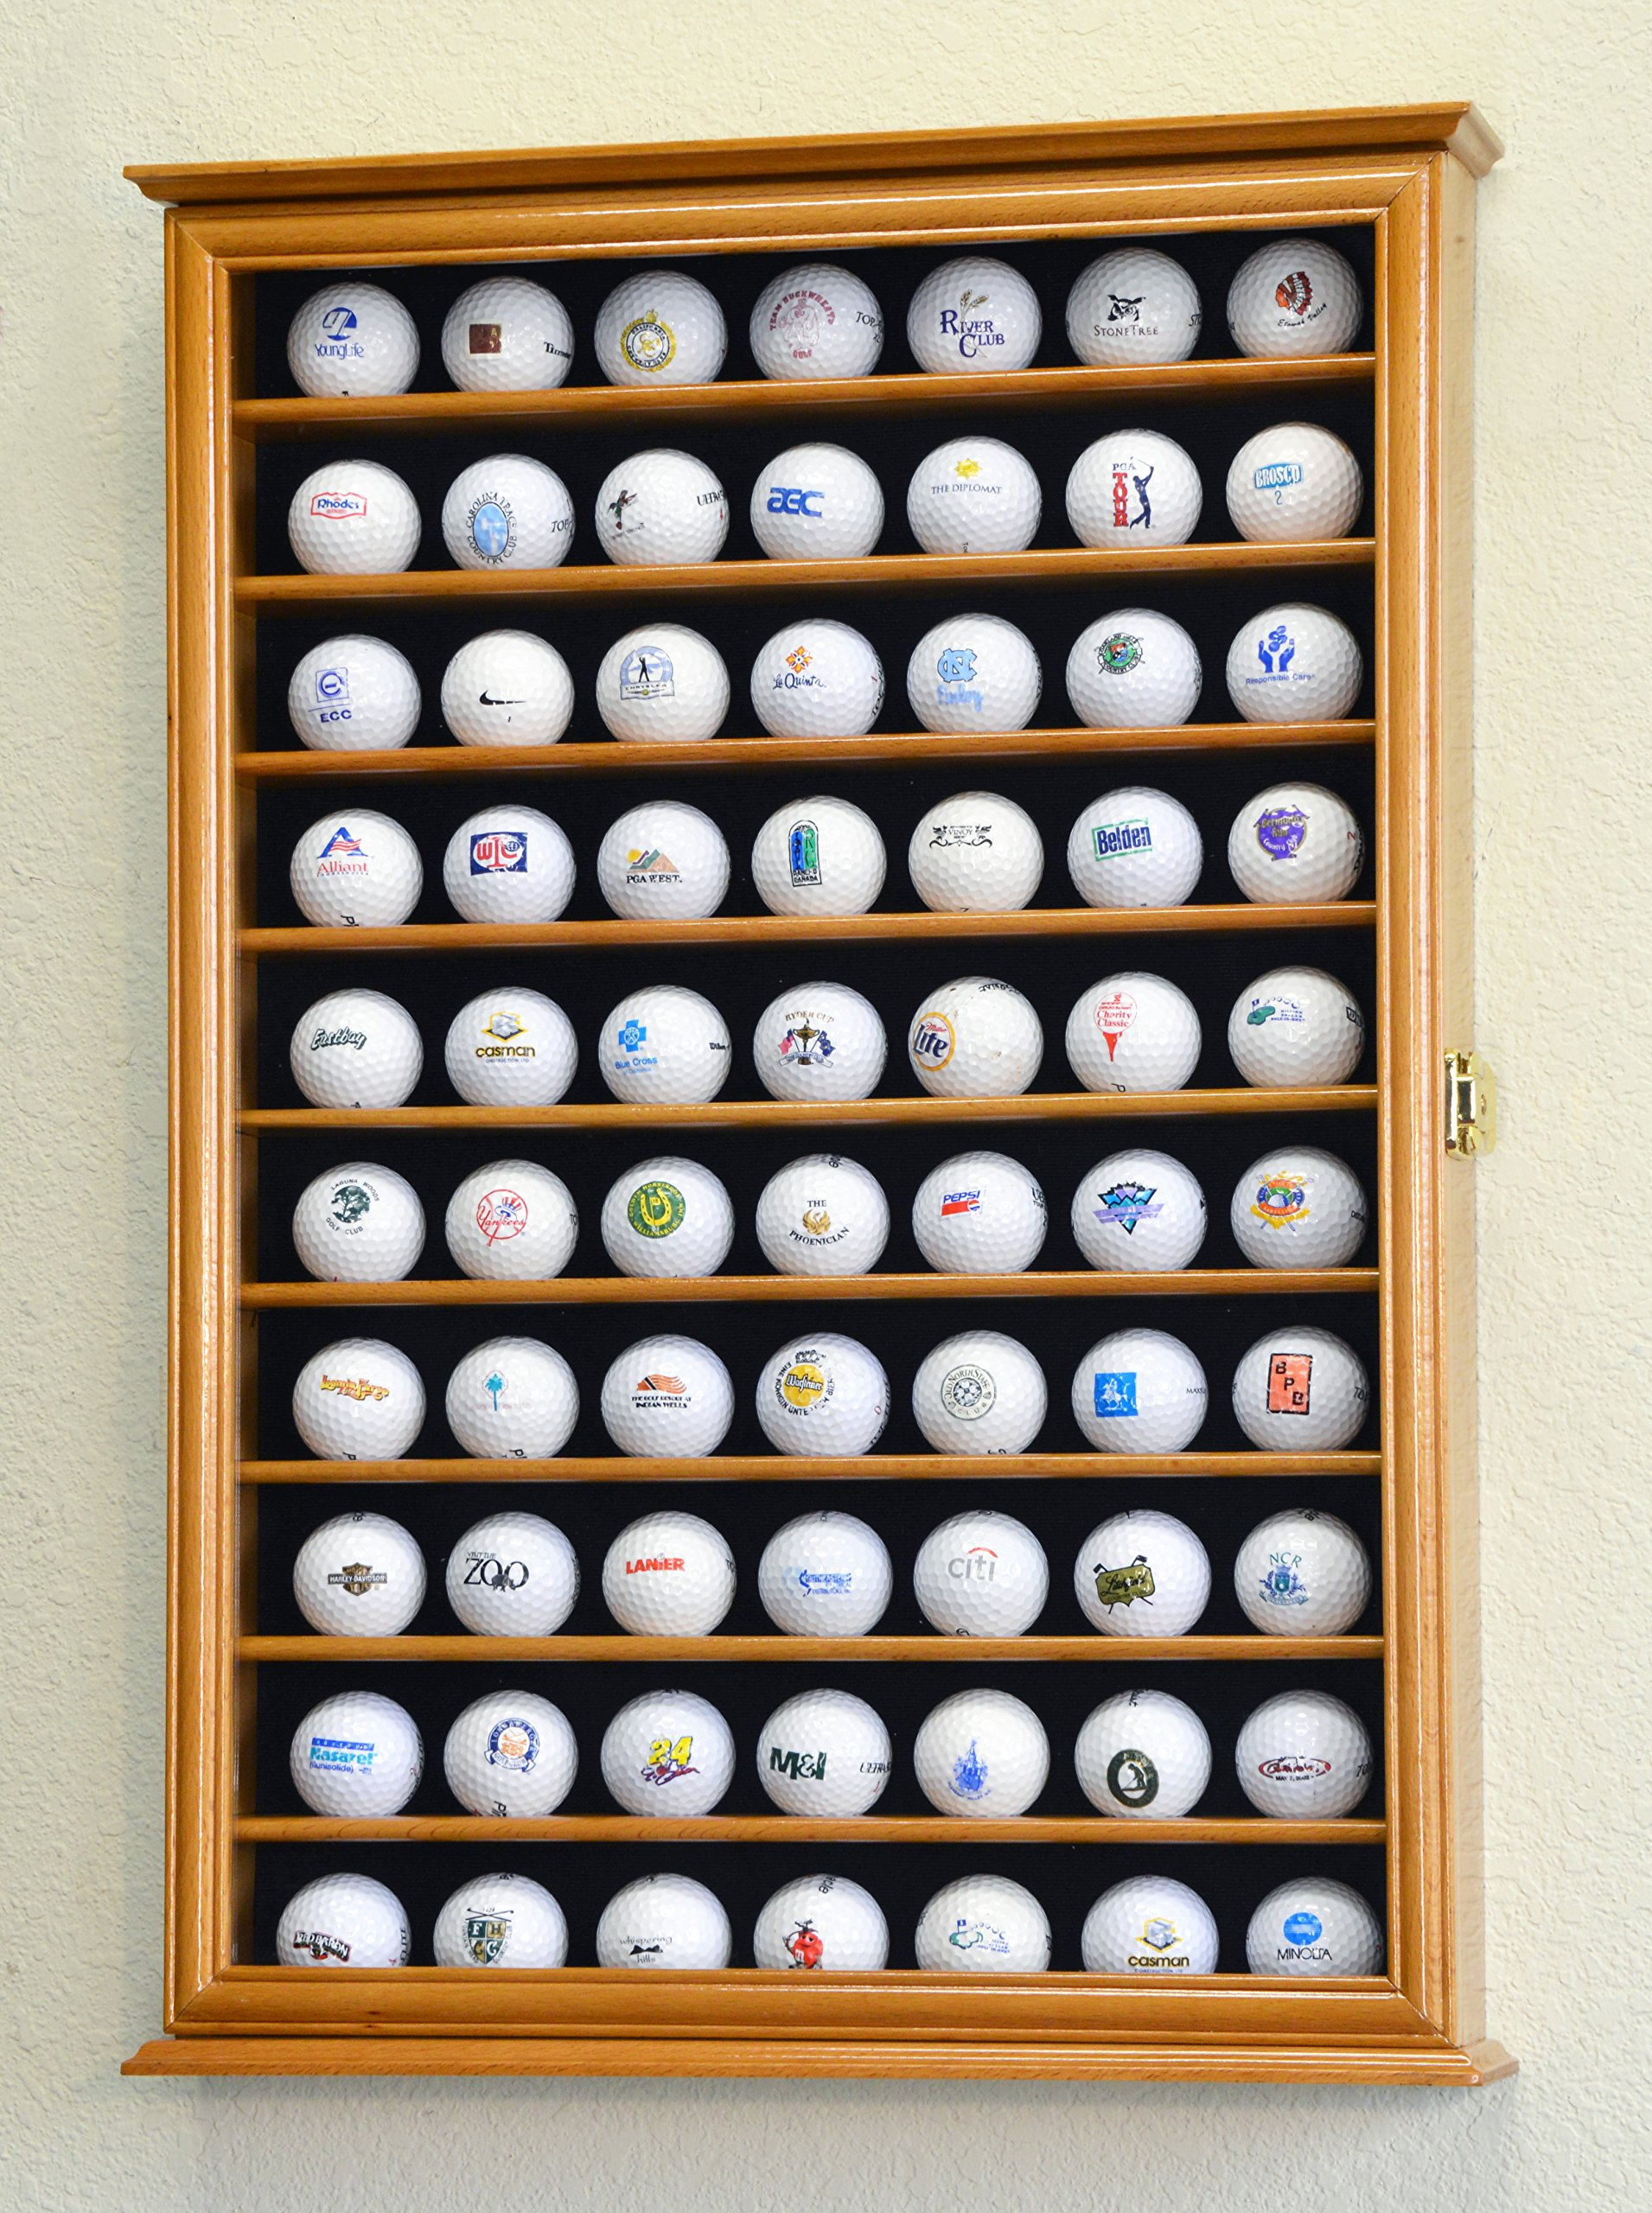 70 Golf Ball Display Case Cabinet Holder Wall Rack w/ UV Protection -Oak by sfDisplay (Image #2)